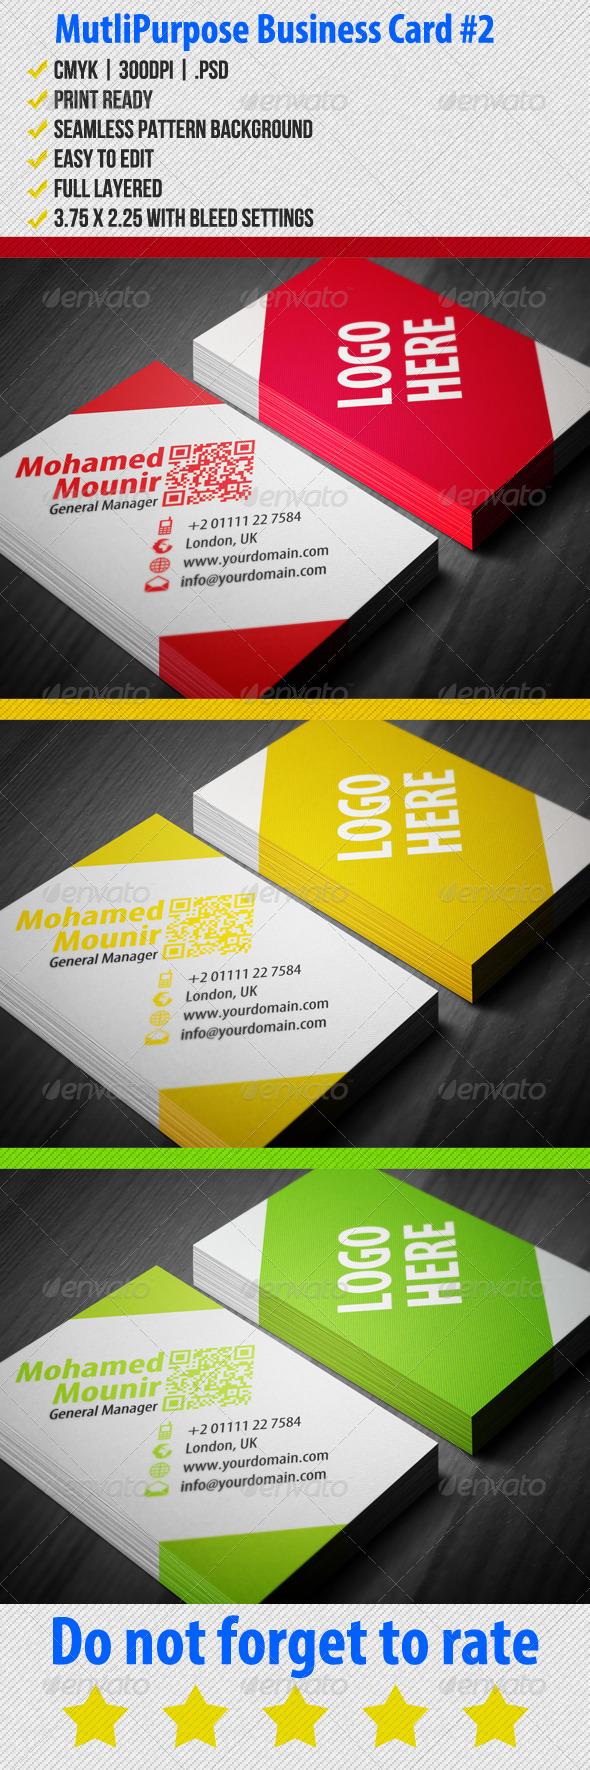 GraphicRiver Multipurpose Business Card 2 3576518